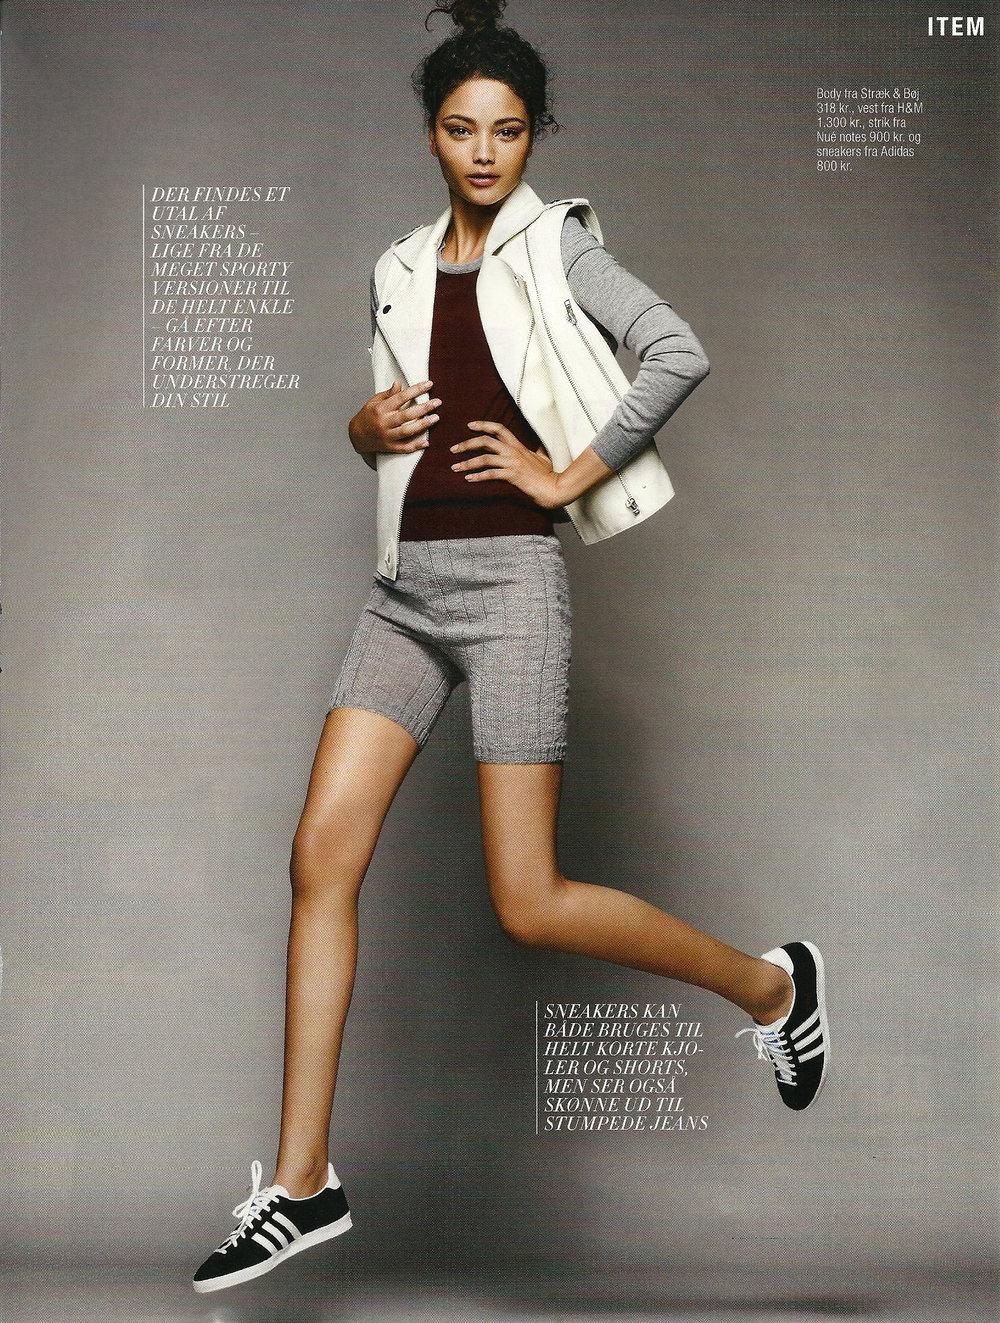 Sana costume mag july 2012 - 2.jpg